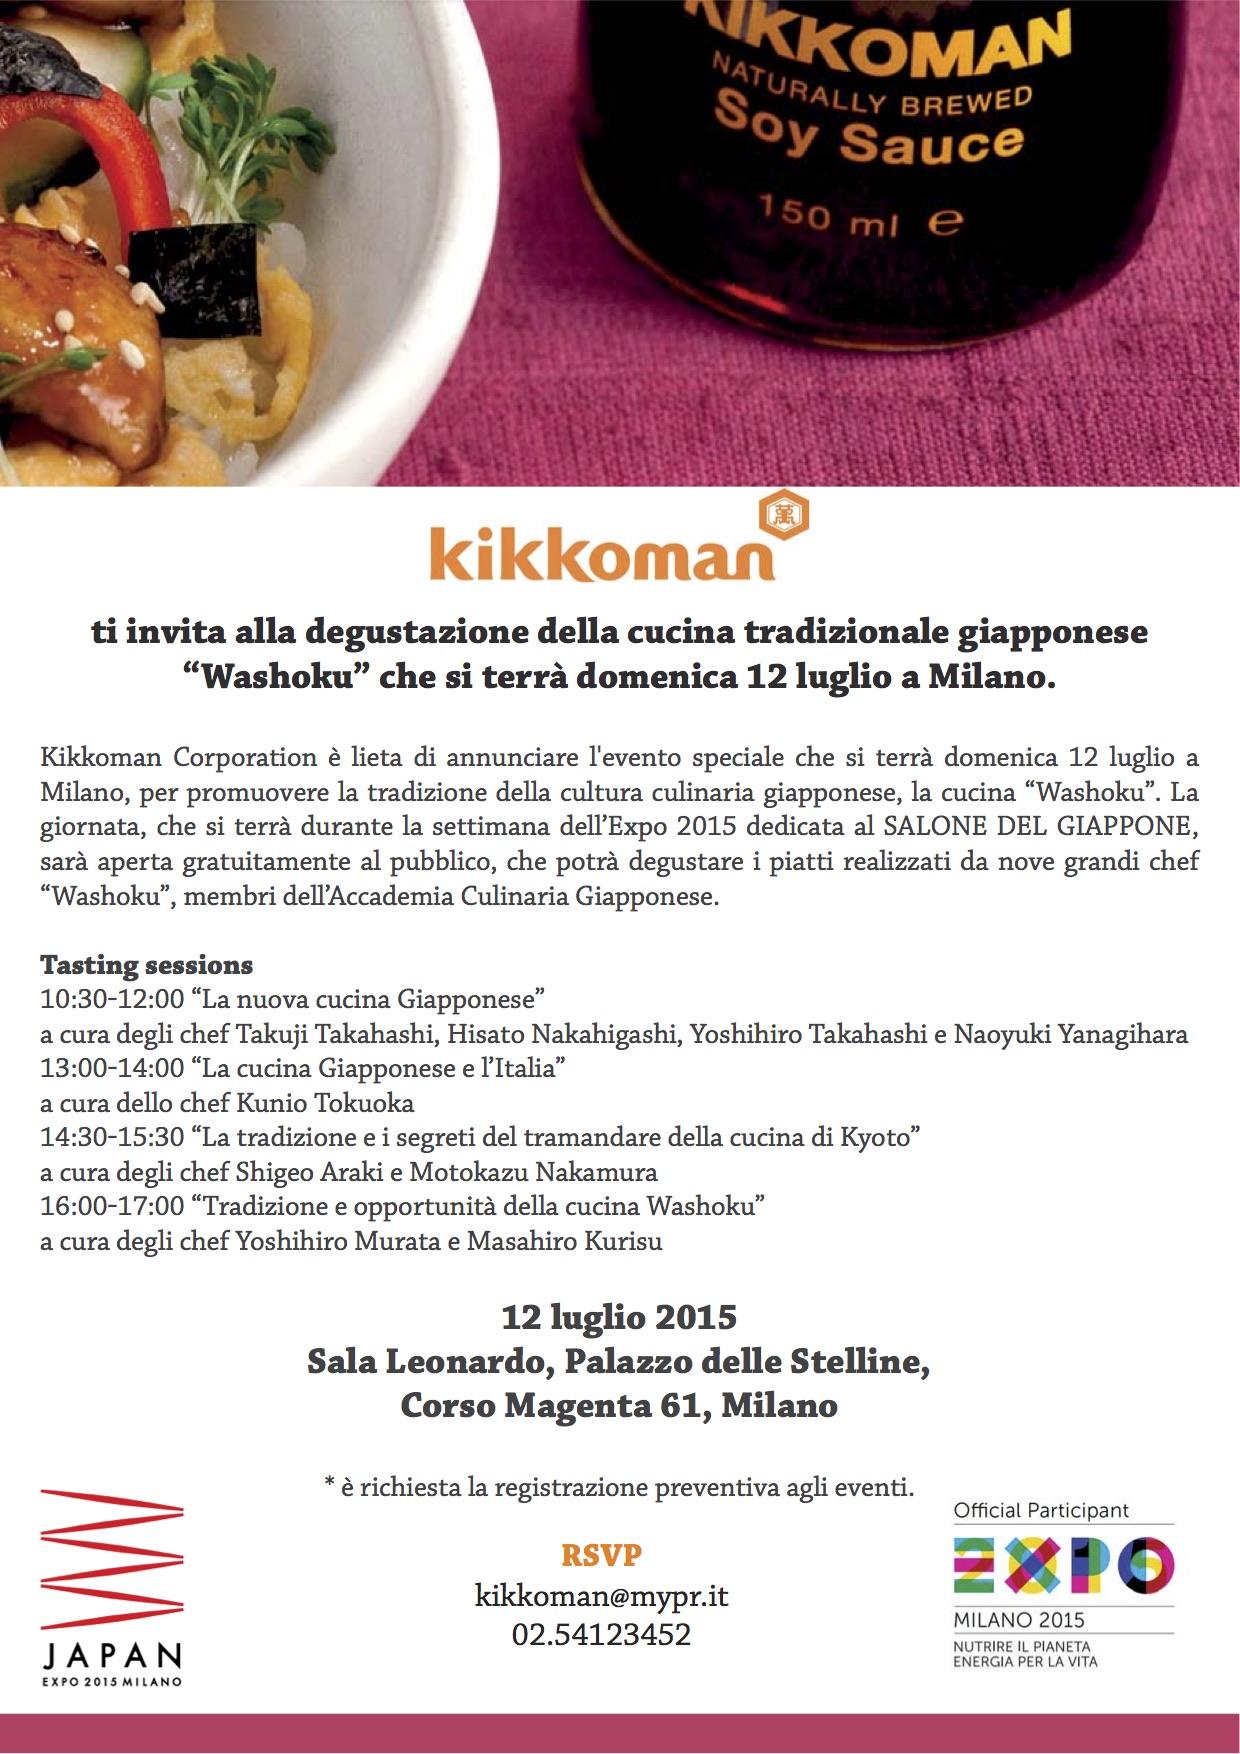 kikkoman e la cucina tradizionale giapponese washoku